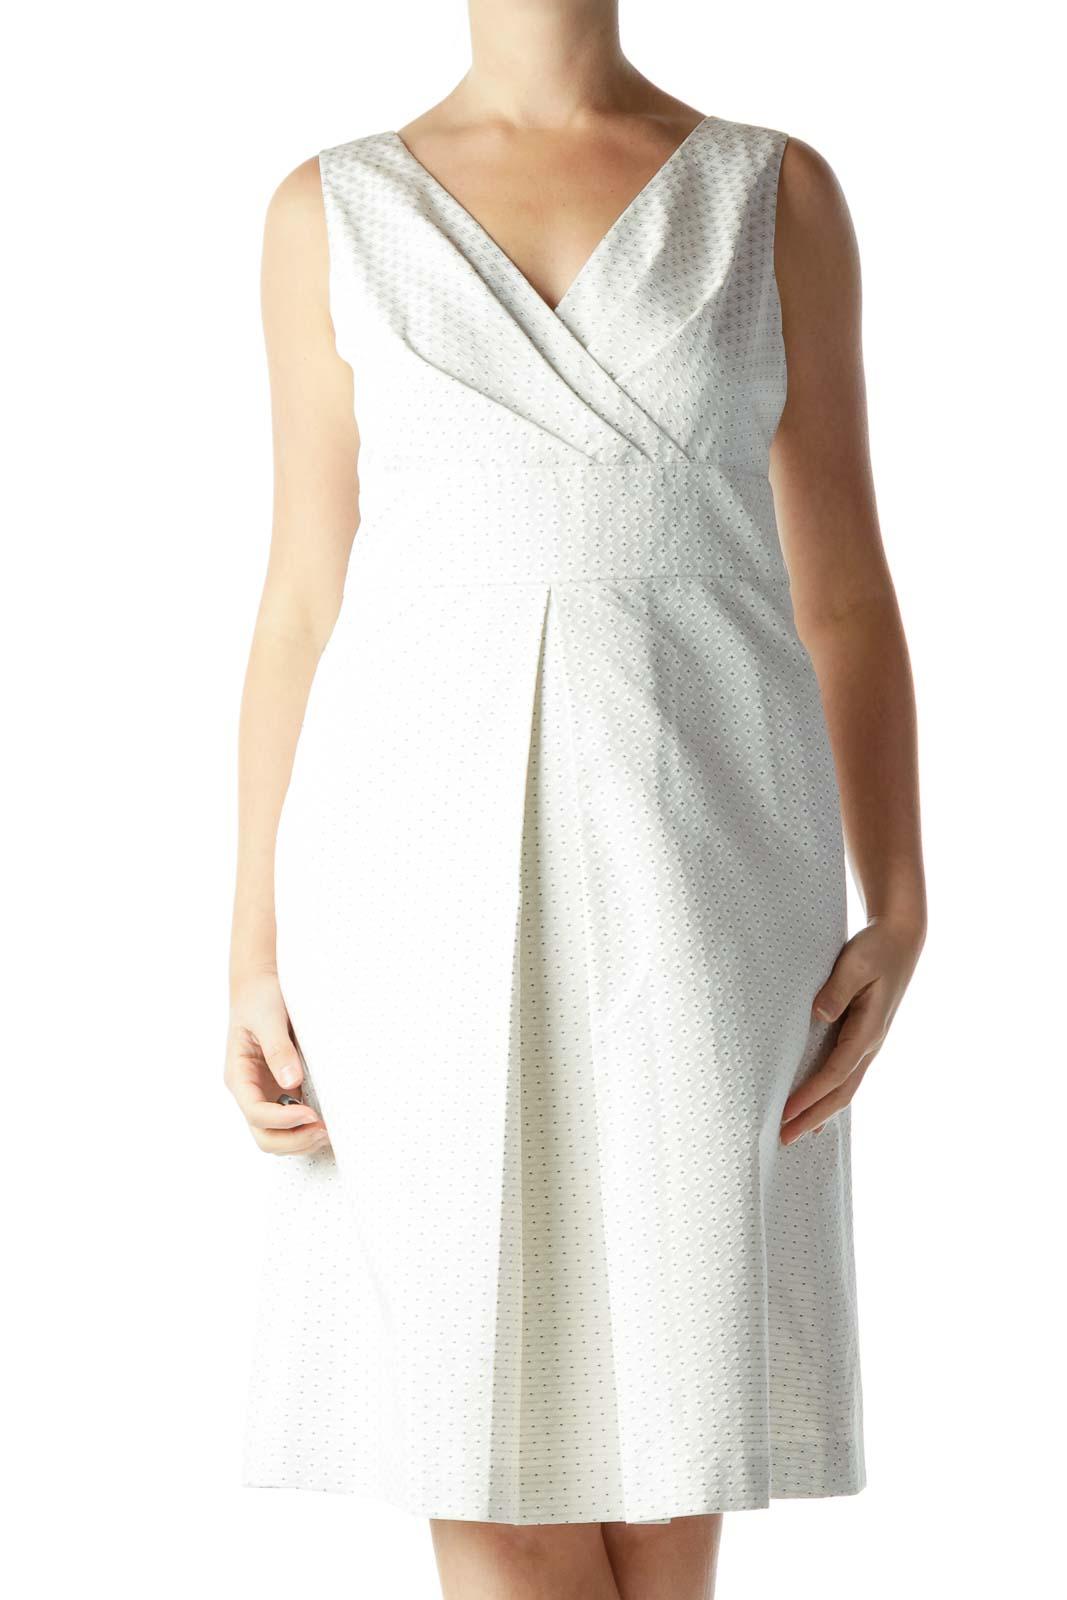 Cream Pocketed Jacquard Dress